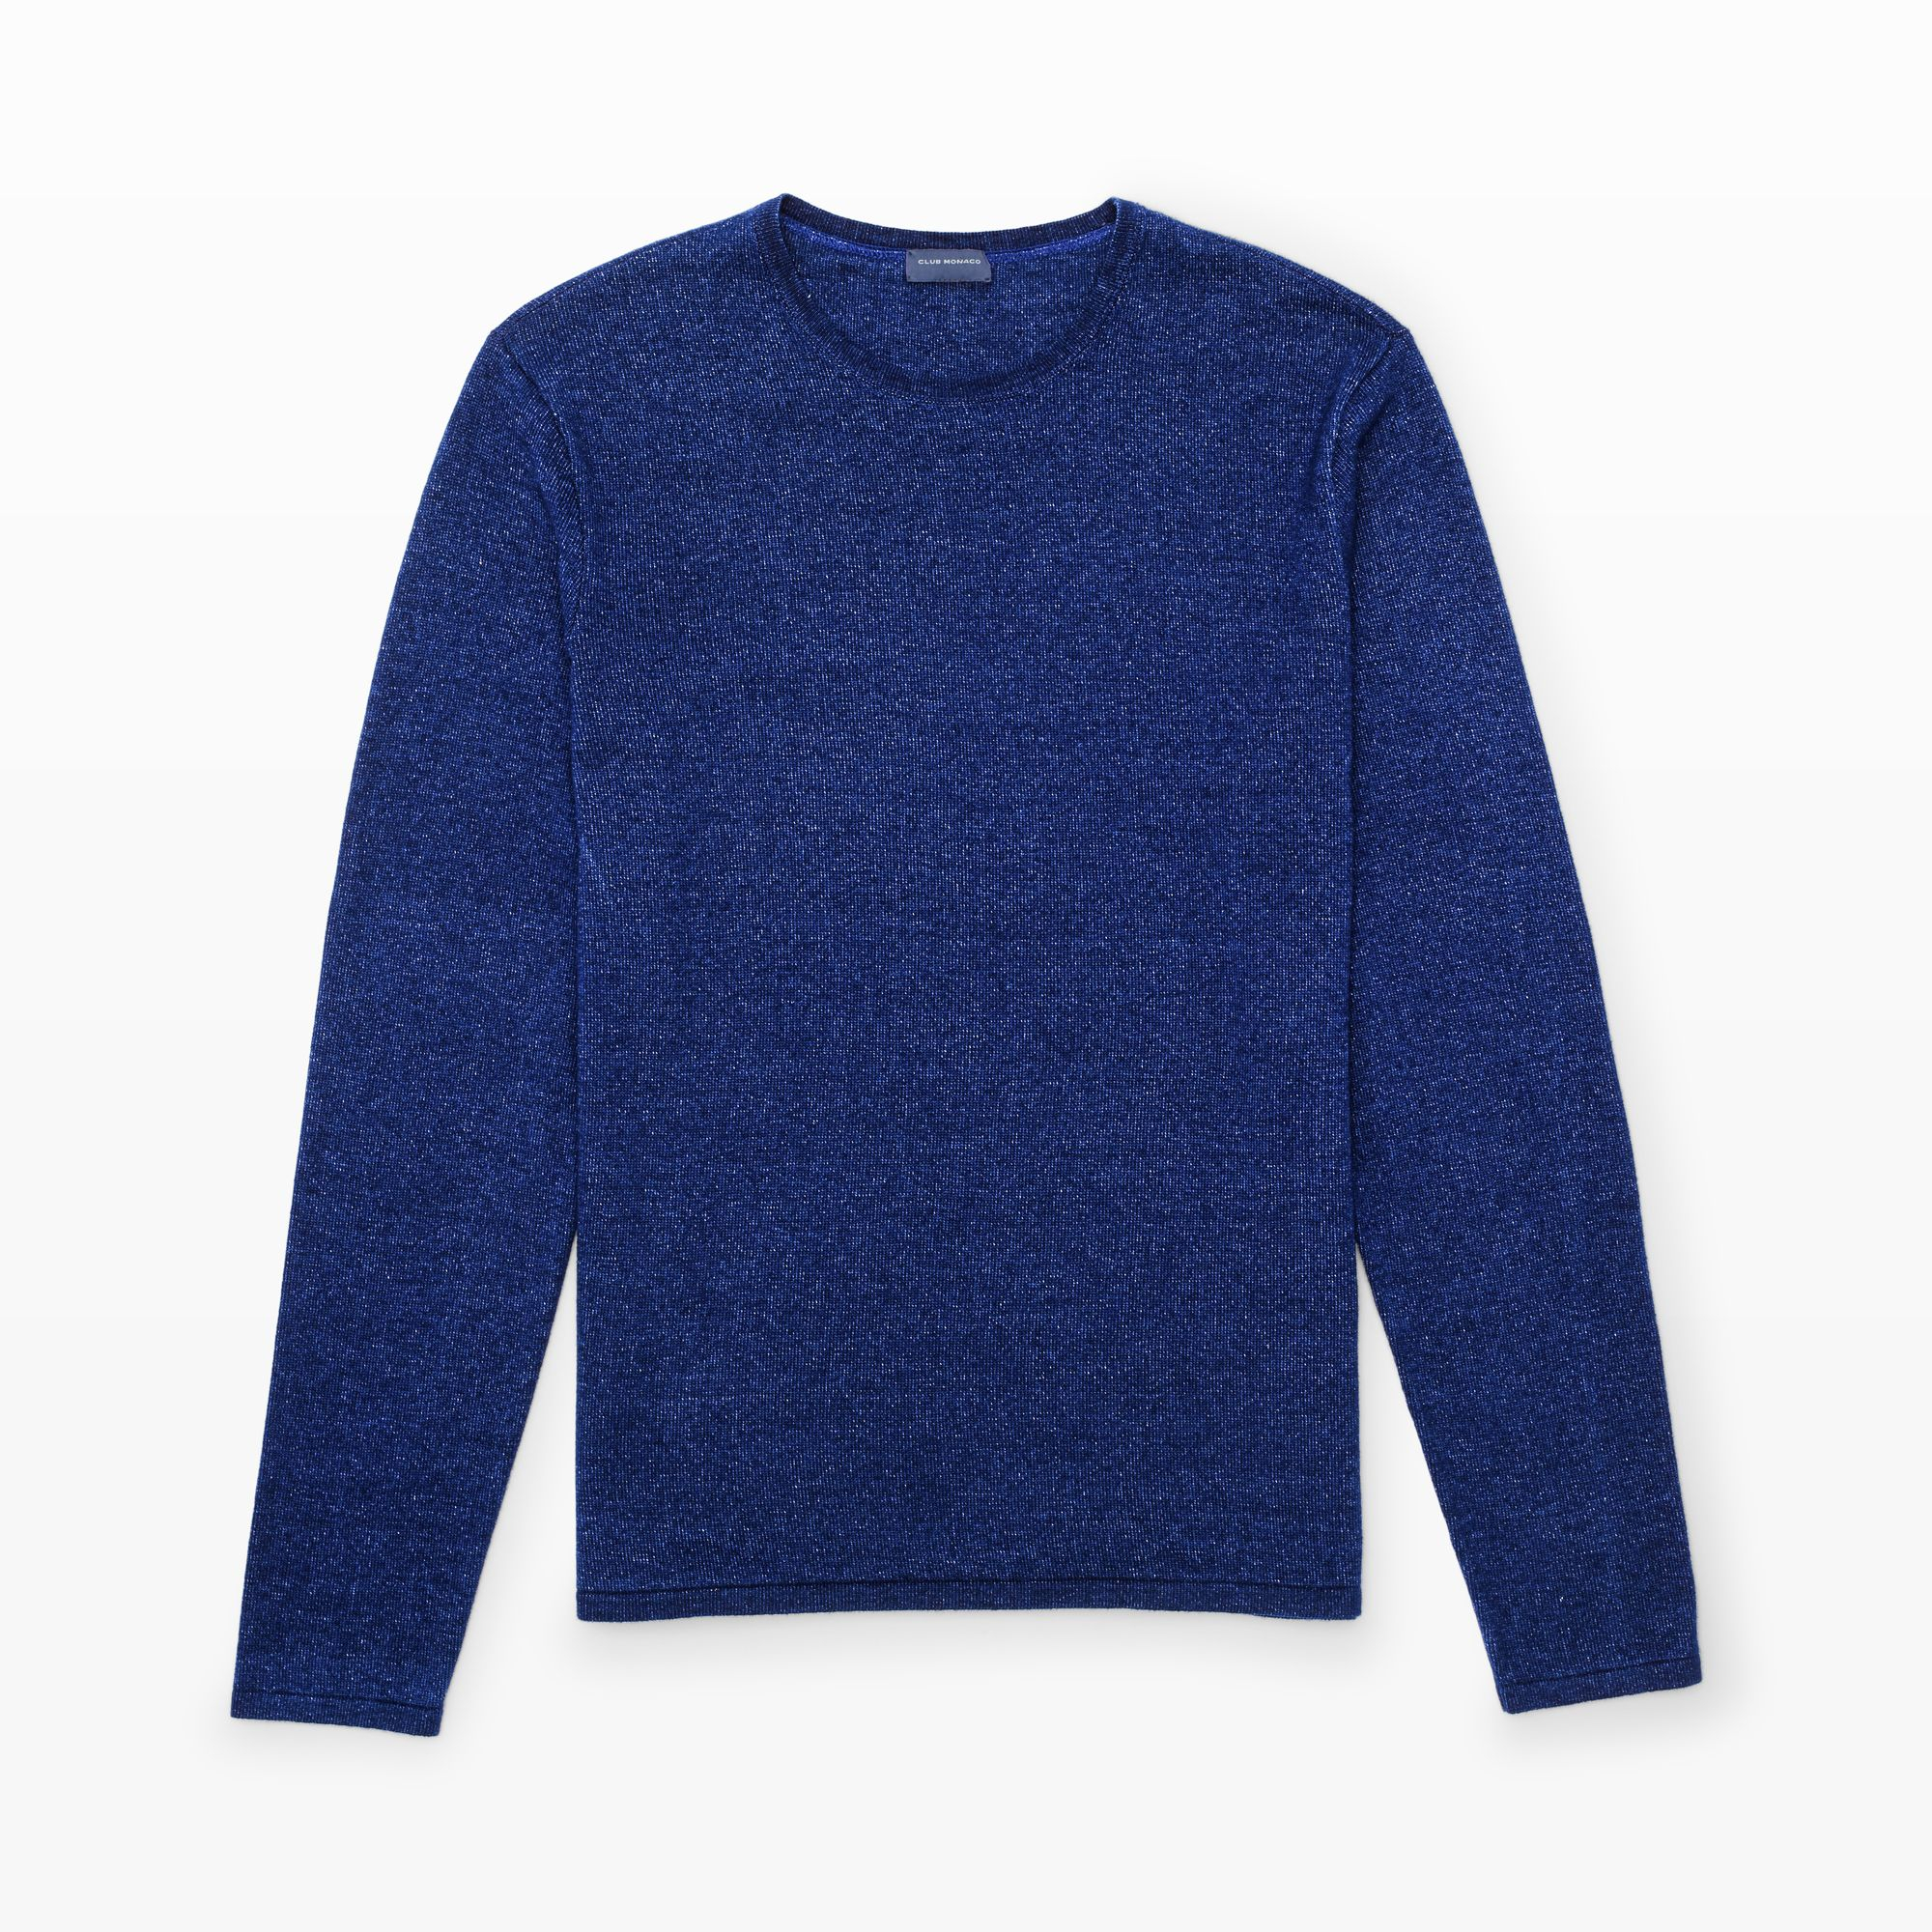 Club monaco Indigo Crewneck Sweater in Blue for Men   Lyst